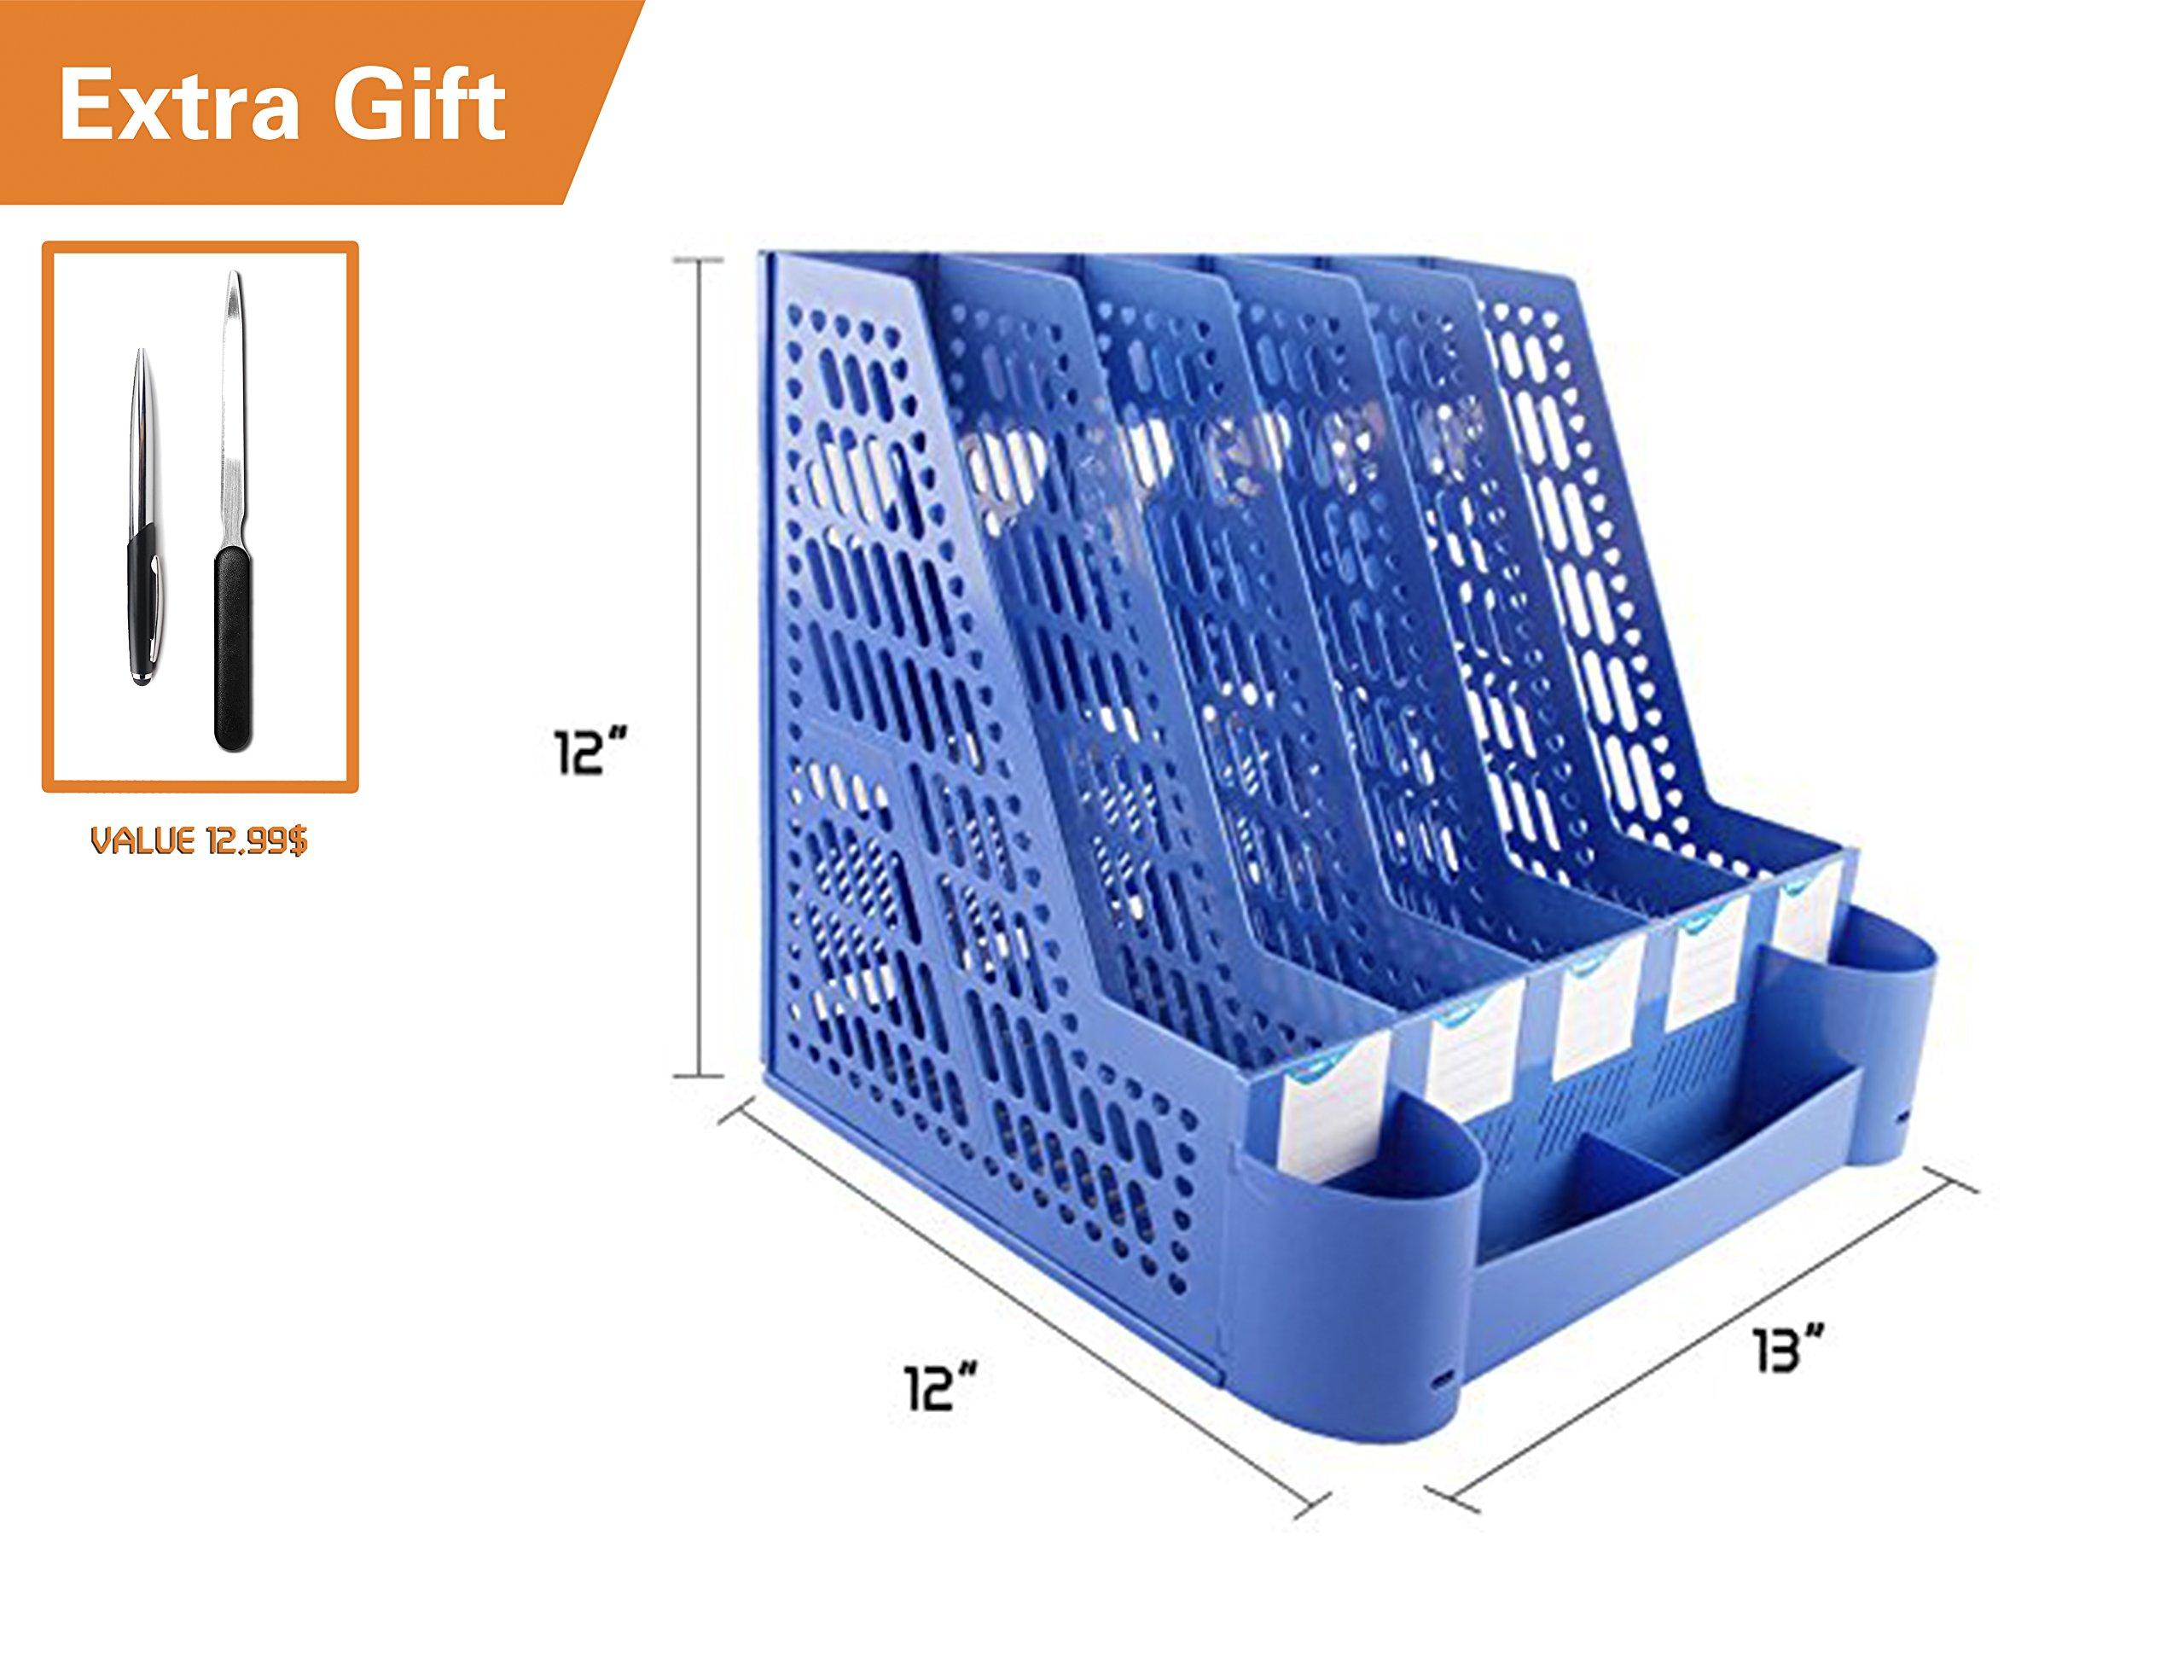 All Décor Office School Home Desk Plastic Magazine Literature File Holder Rack Case Box Crate Organizer,3/4/5 Slots,Blue/Grey. (L 13'' x W 12'' x H 12'')